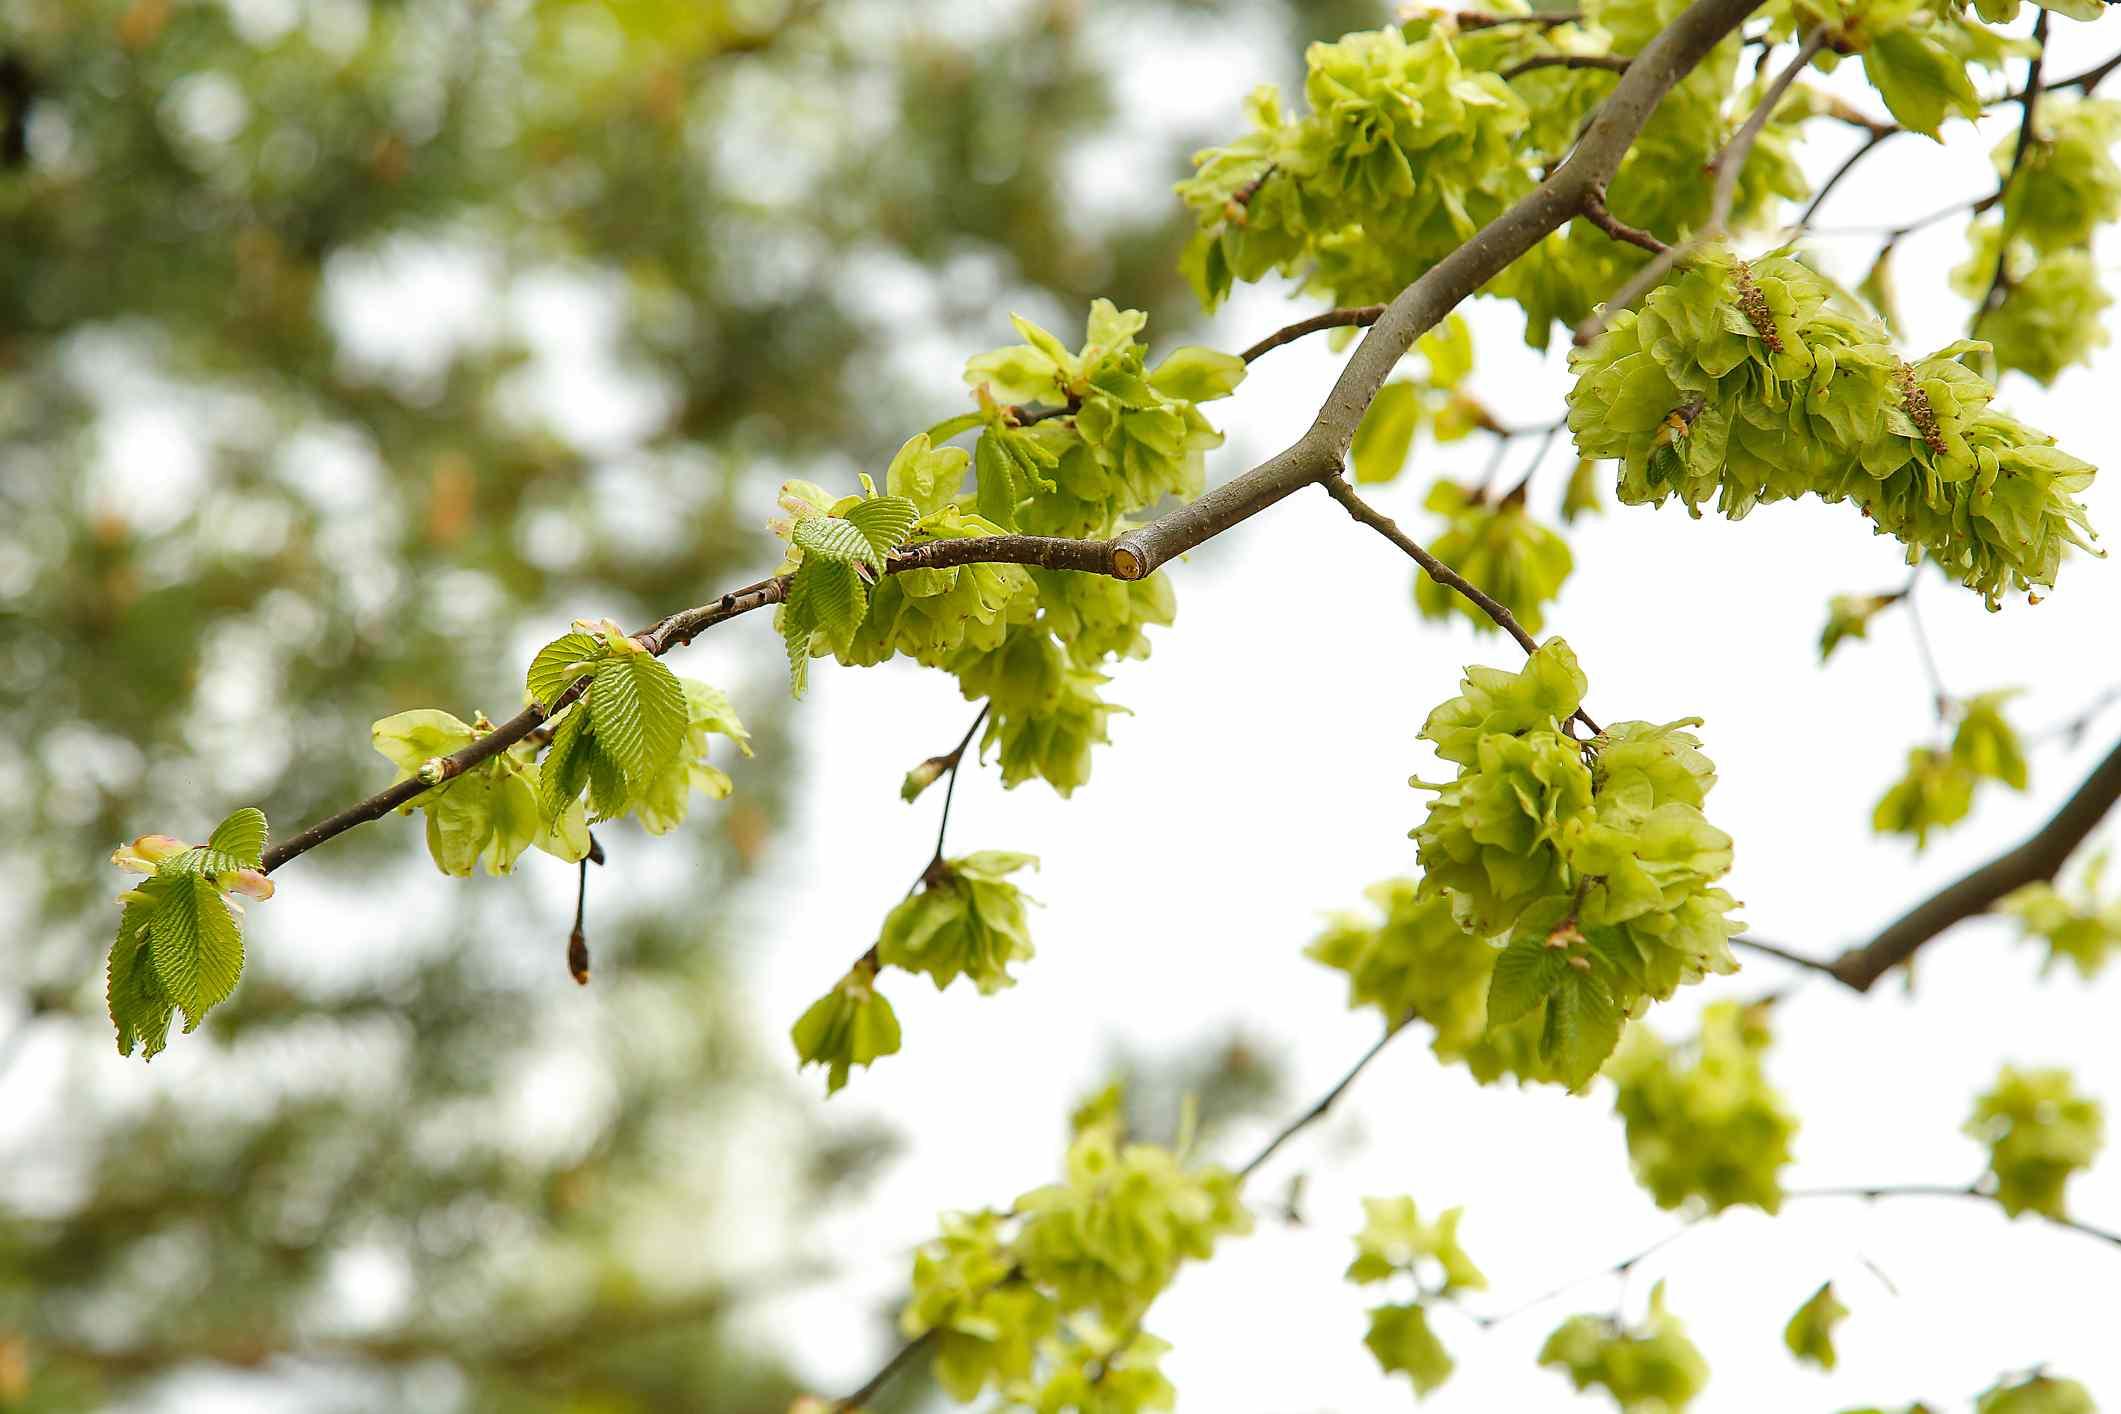 Foliage of camperdown elm tree